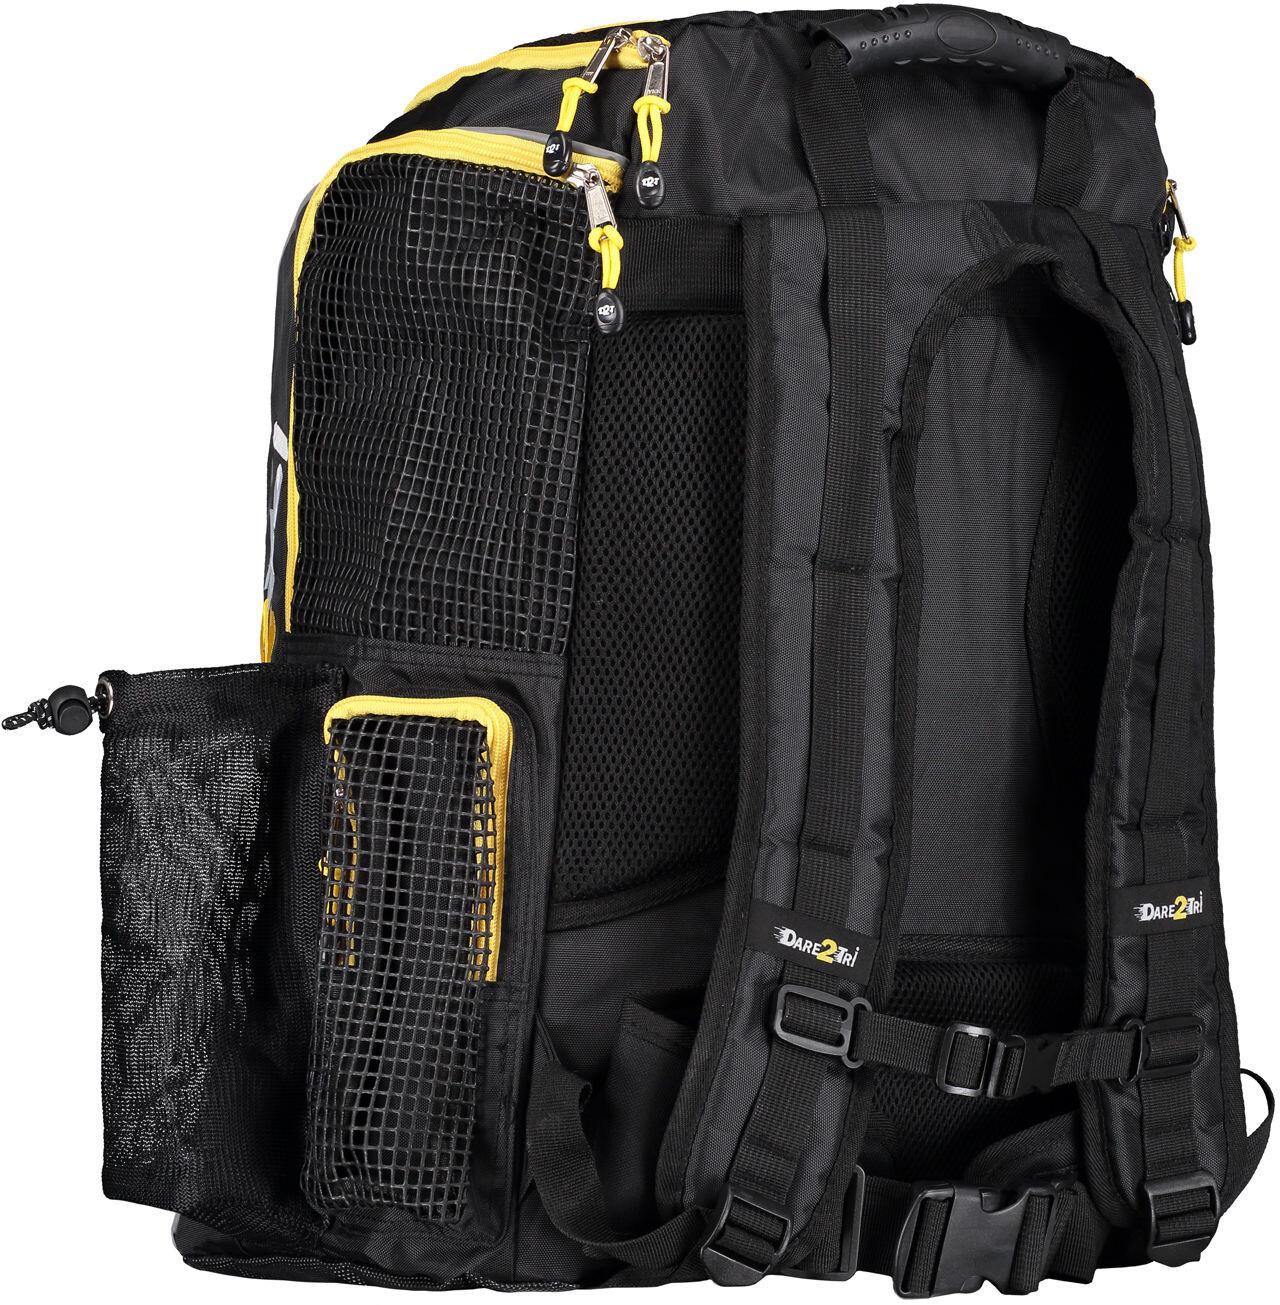 Dare2tri Transition Backpack 33l Black Yellow G 252 Nstig